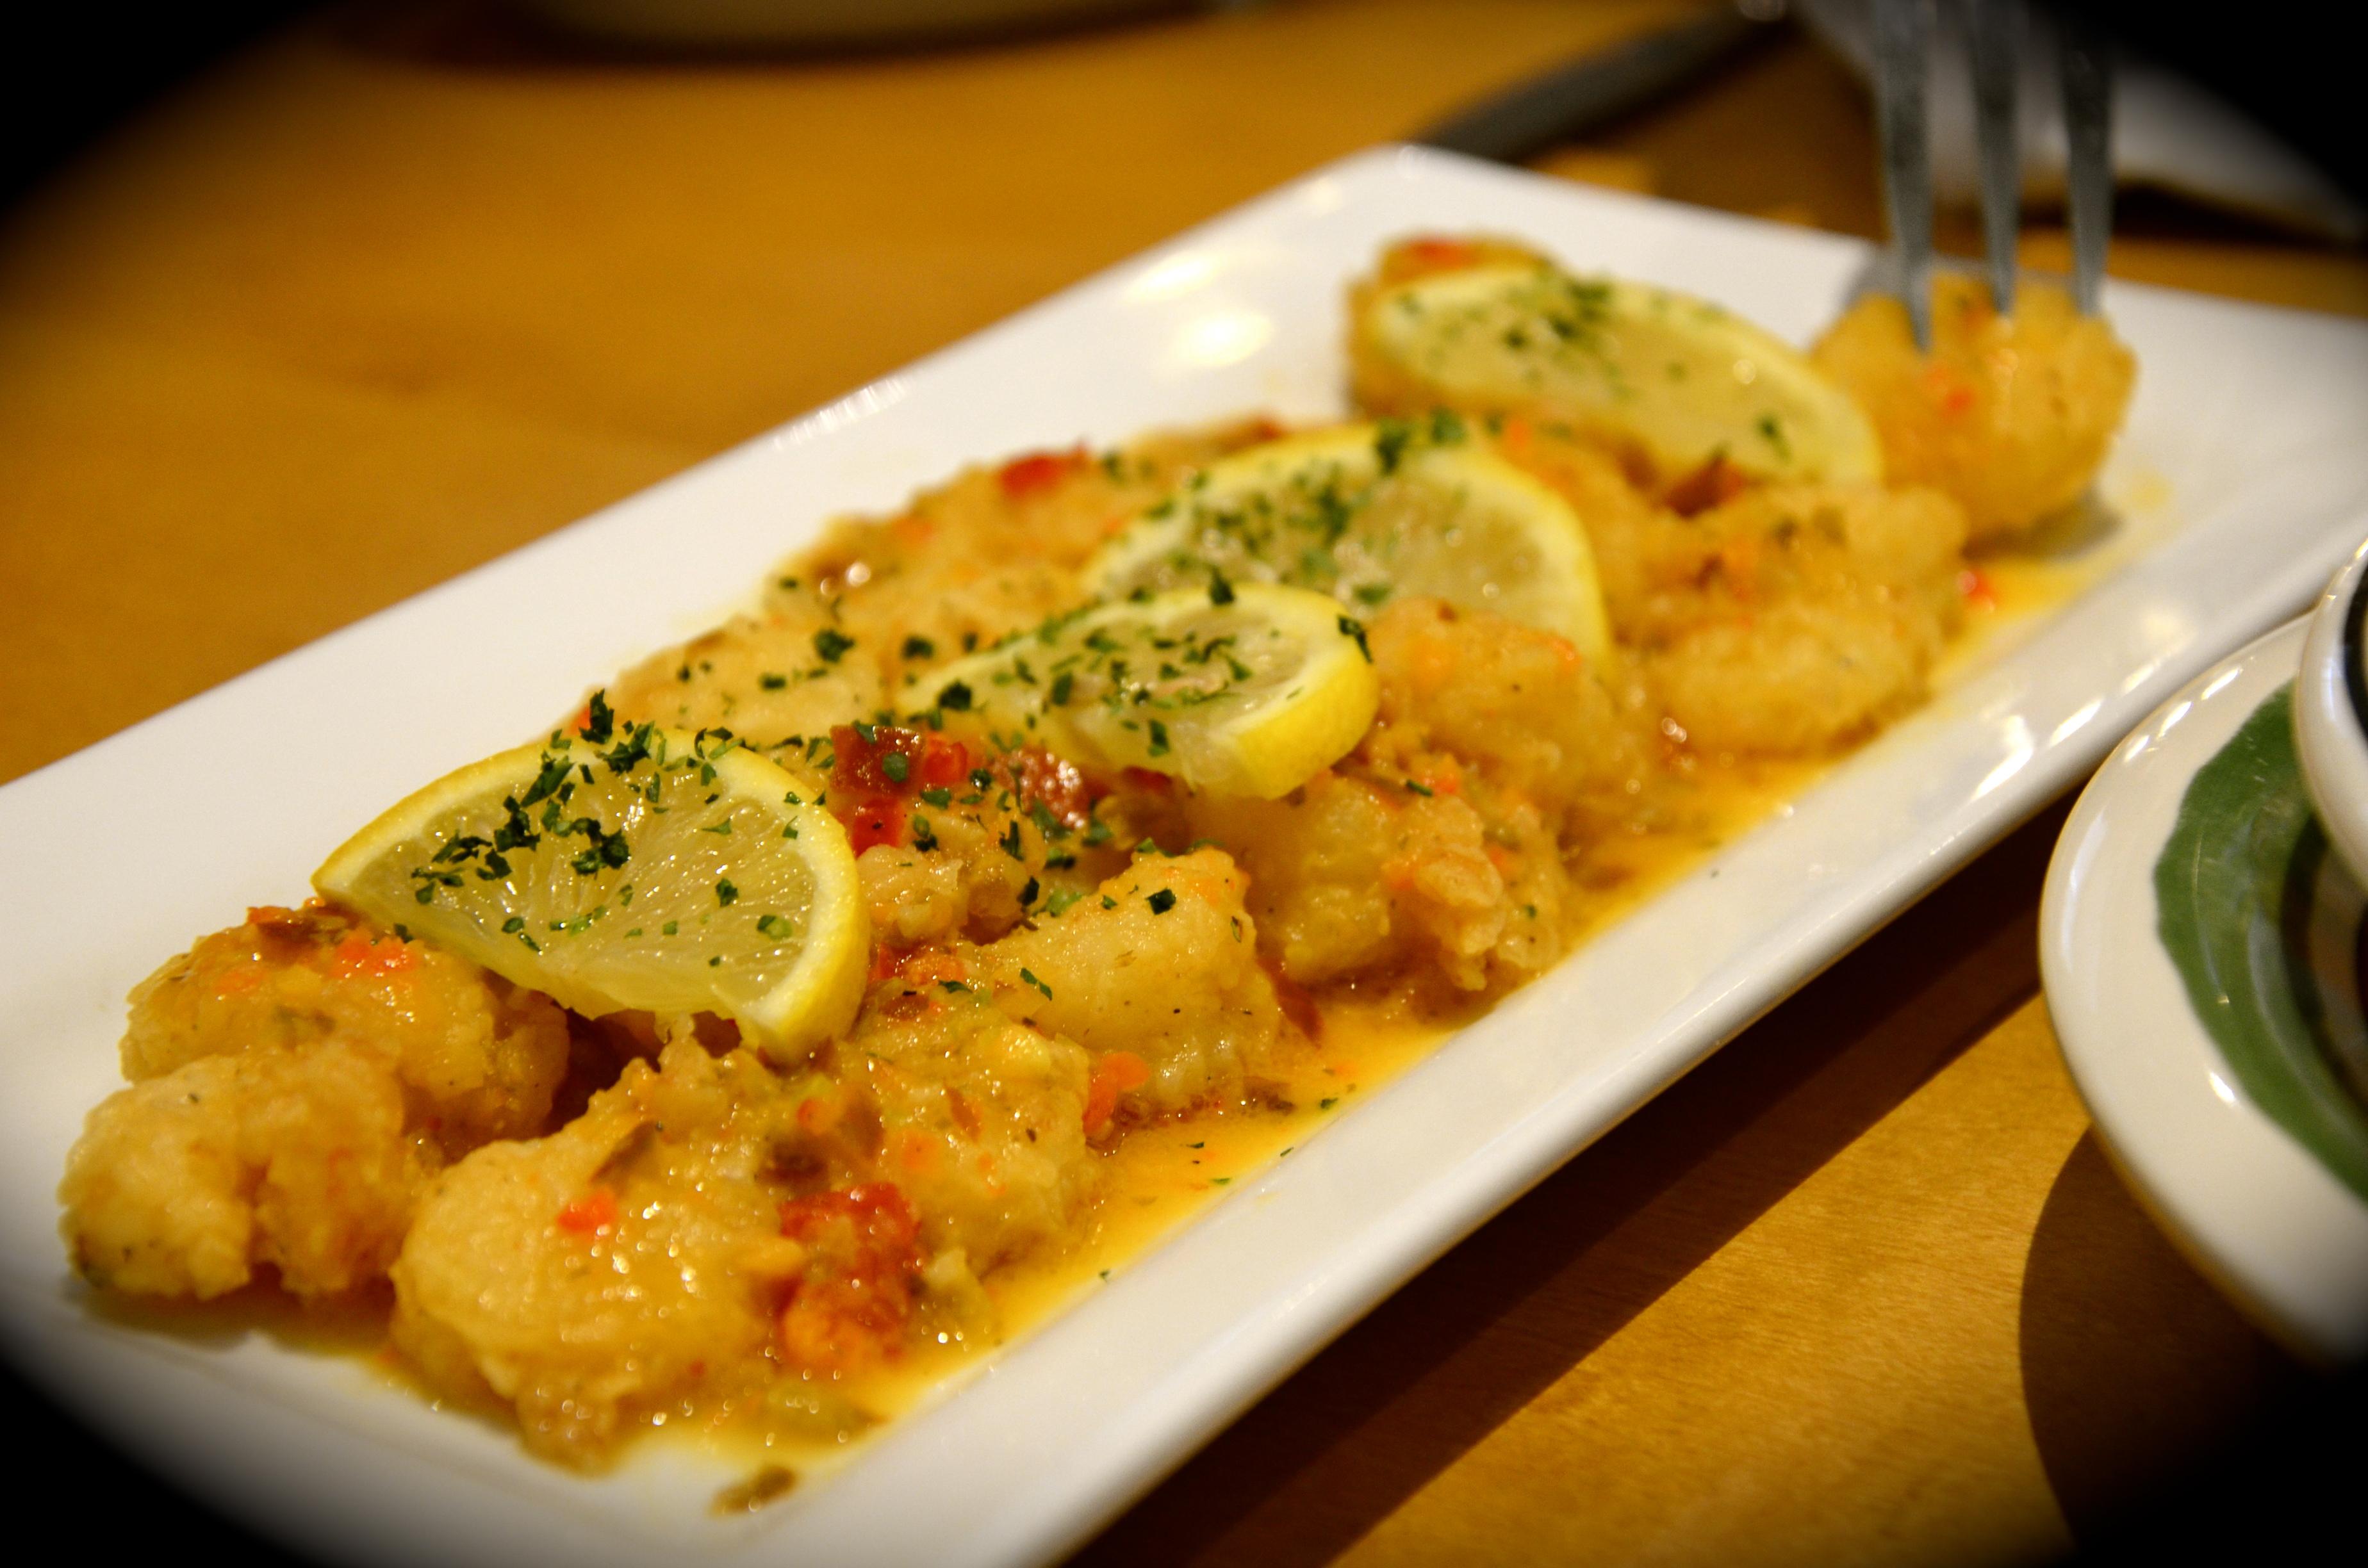 Shrimp scampi fritta dhs 39 - Olive garden shrimp scampi fritta recipe ...